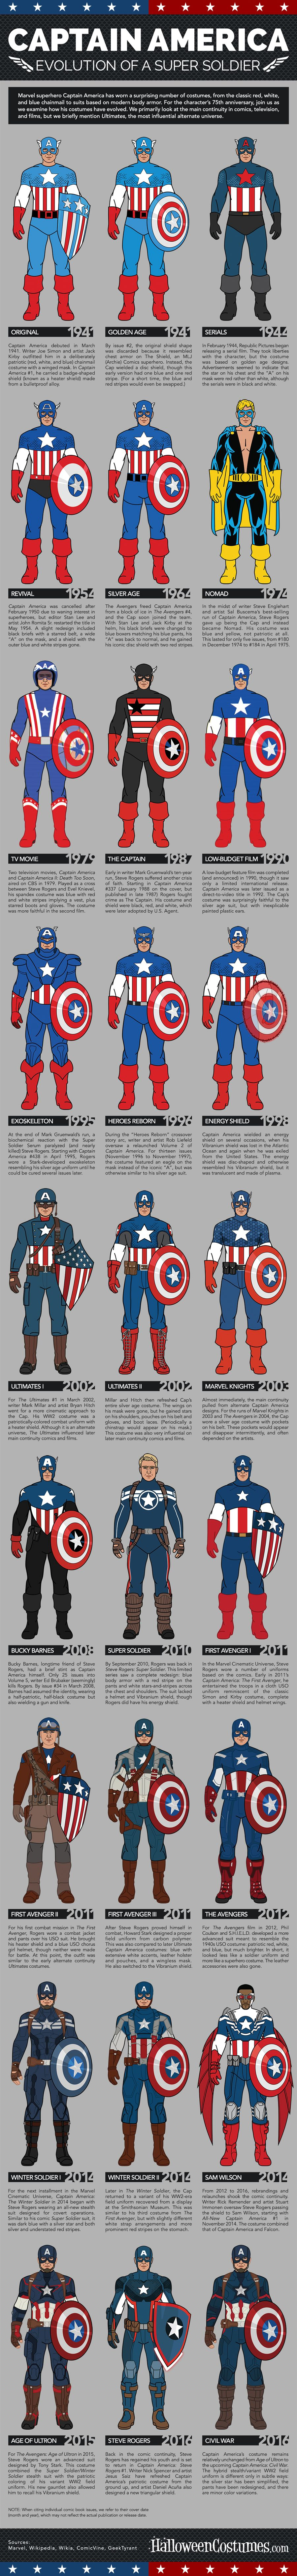 Marvel Superheroes Height Comparison Chart | Marvel | Pinterest ...